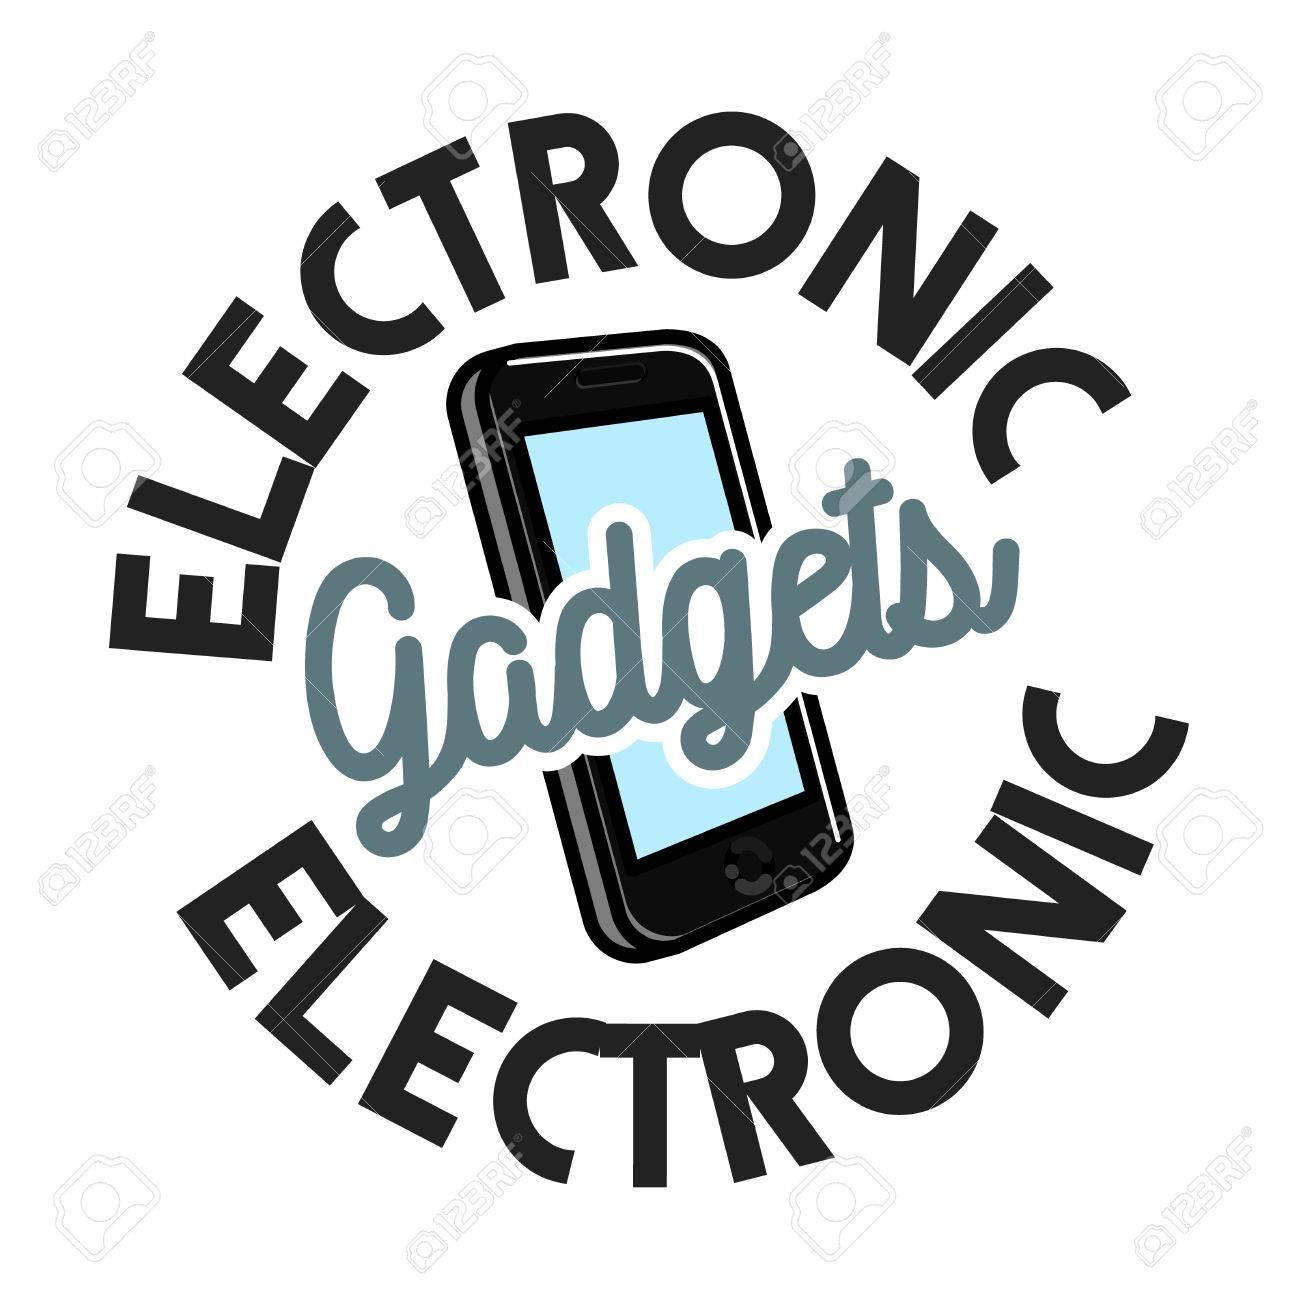 Color Vintage Electronic Gadgets Emblem Royalty Free Cliparts